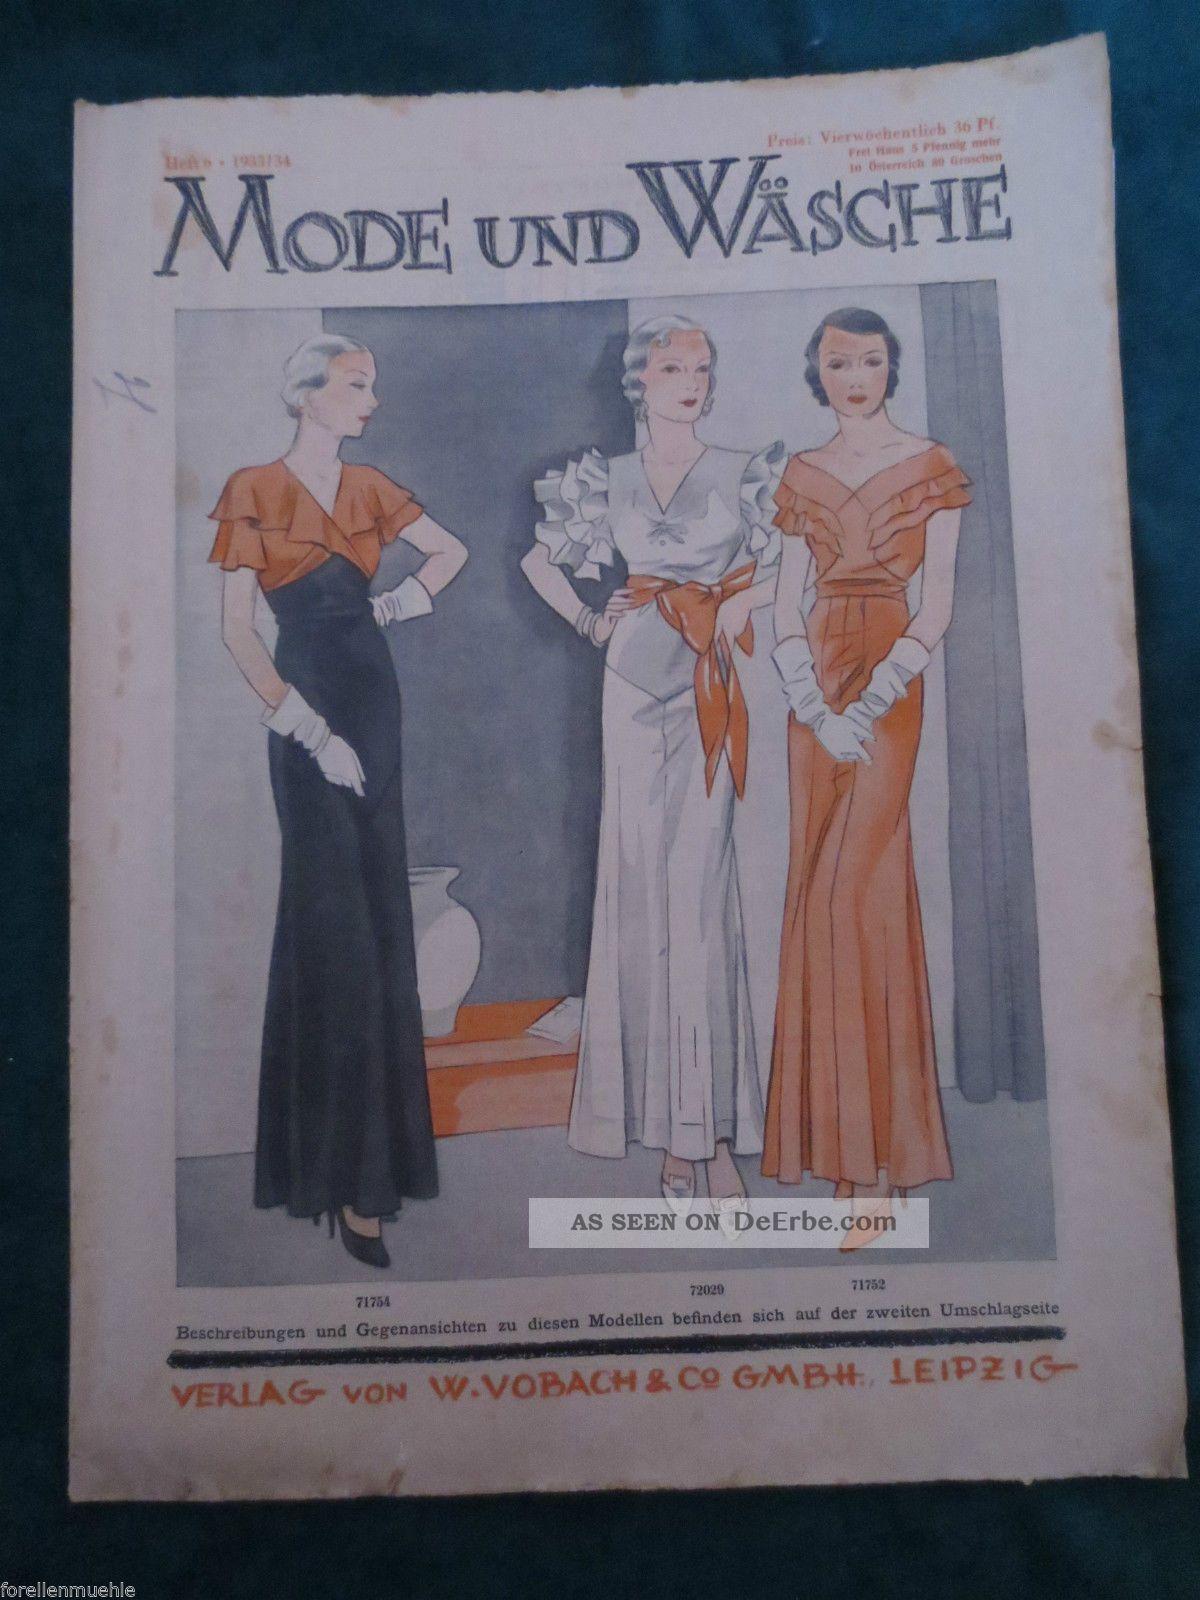 Kleidung & Accessoires - Kleidung - Damenkleidung - Antiquitäten